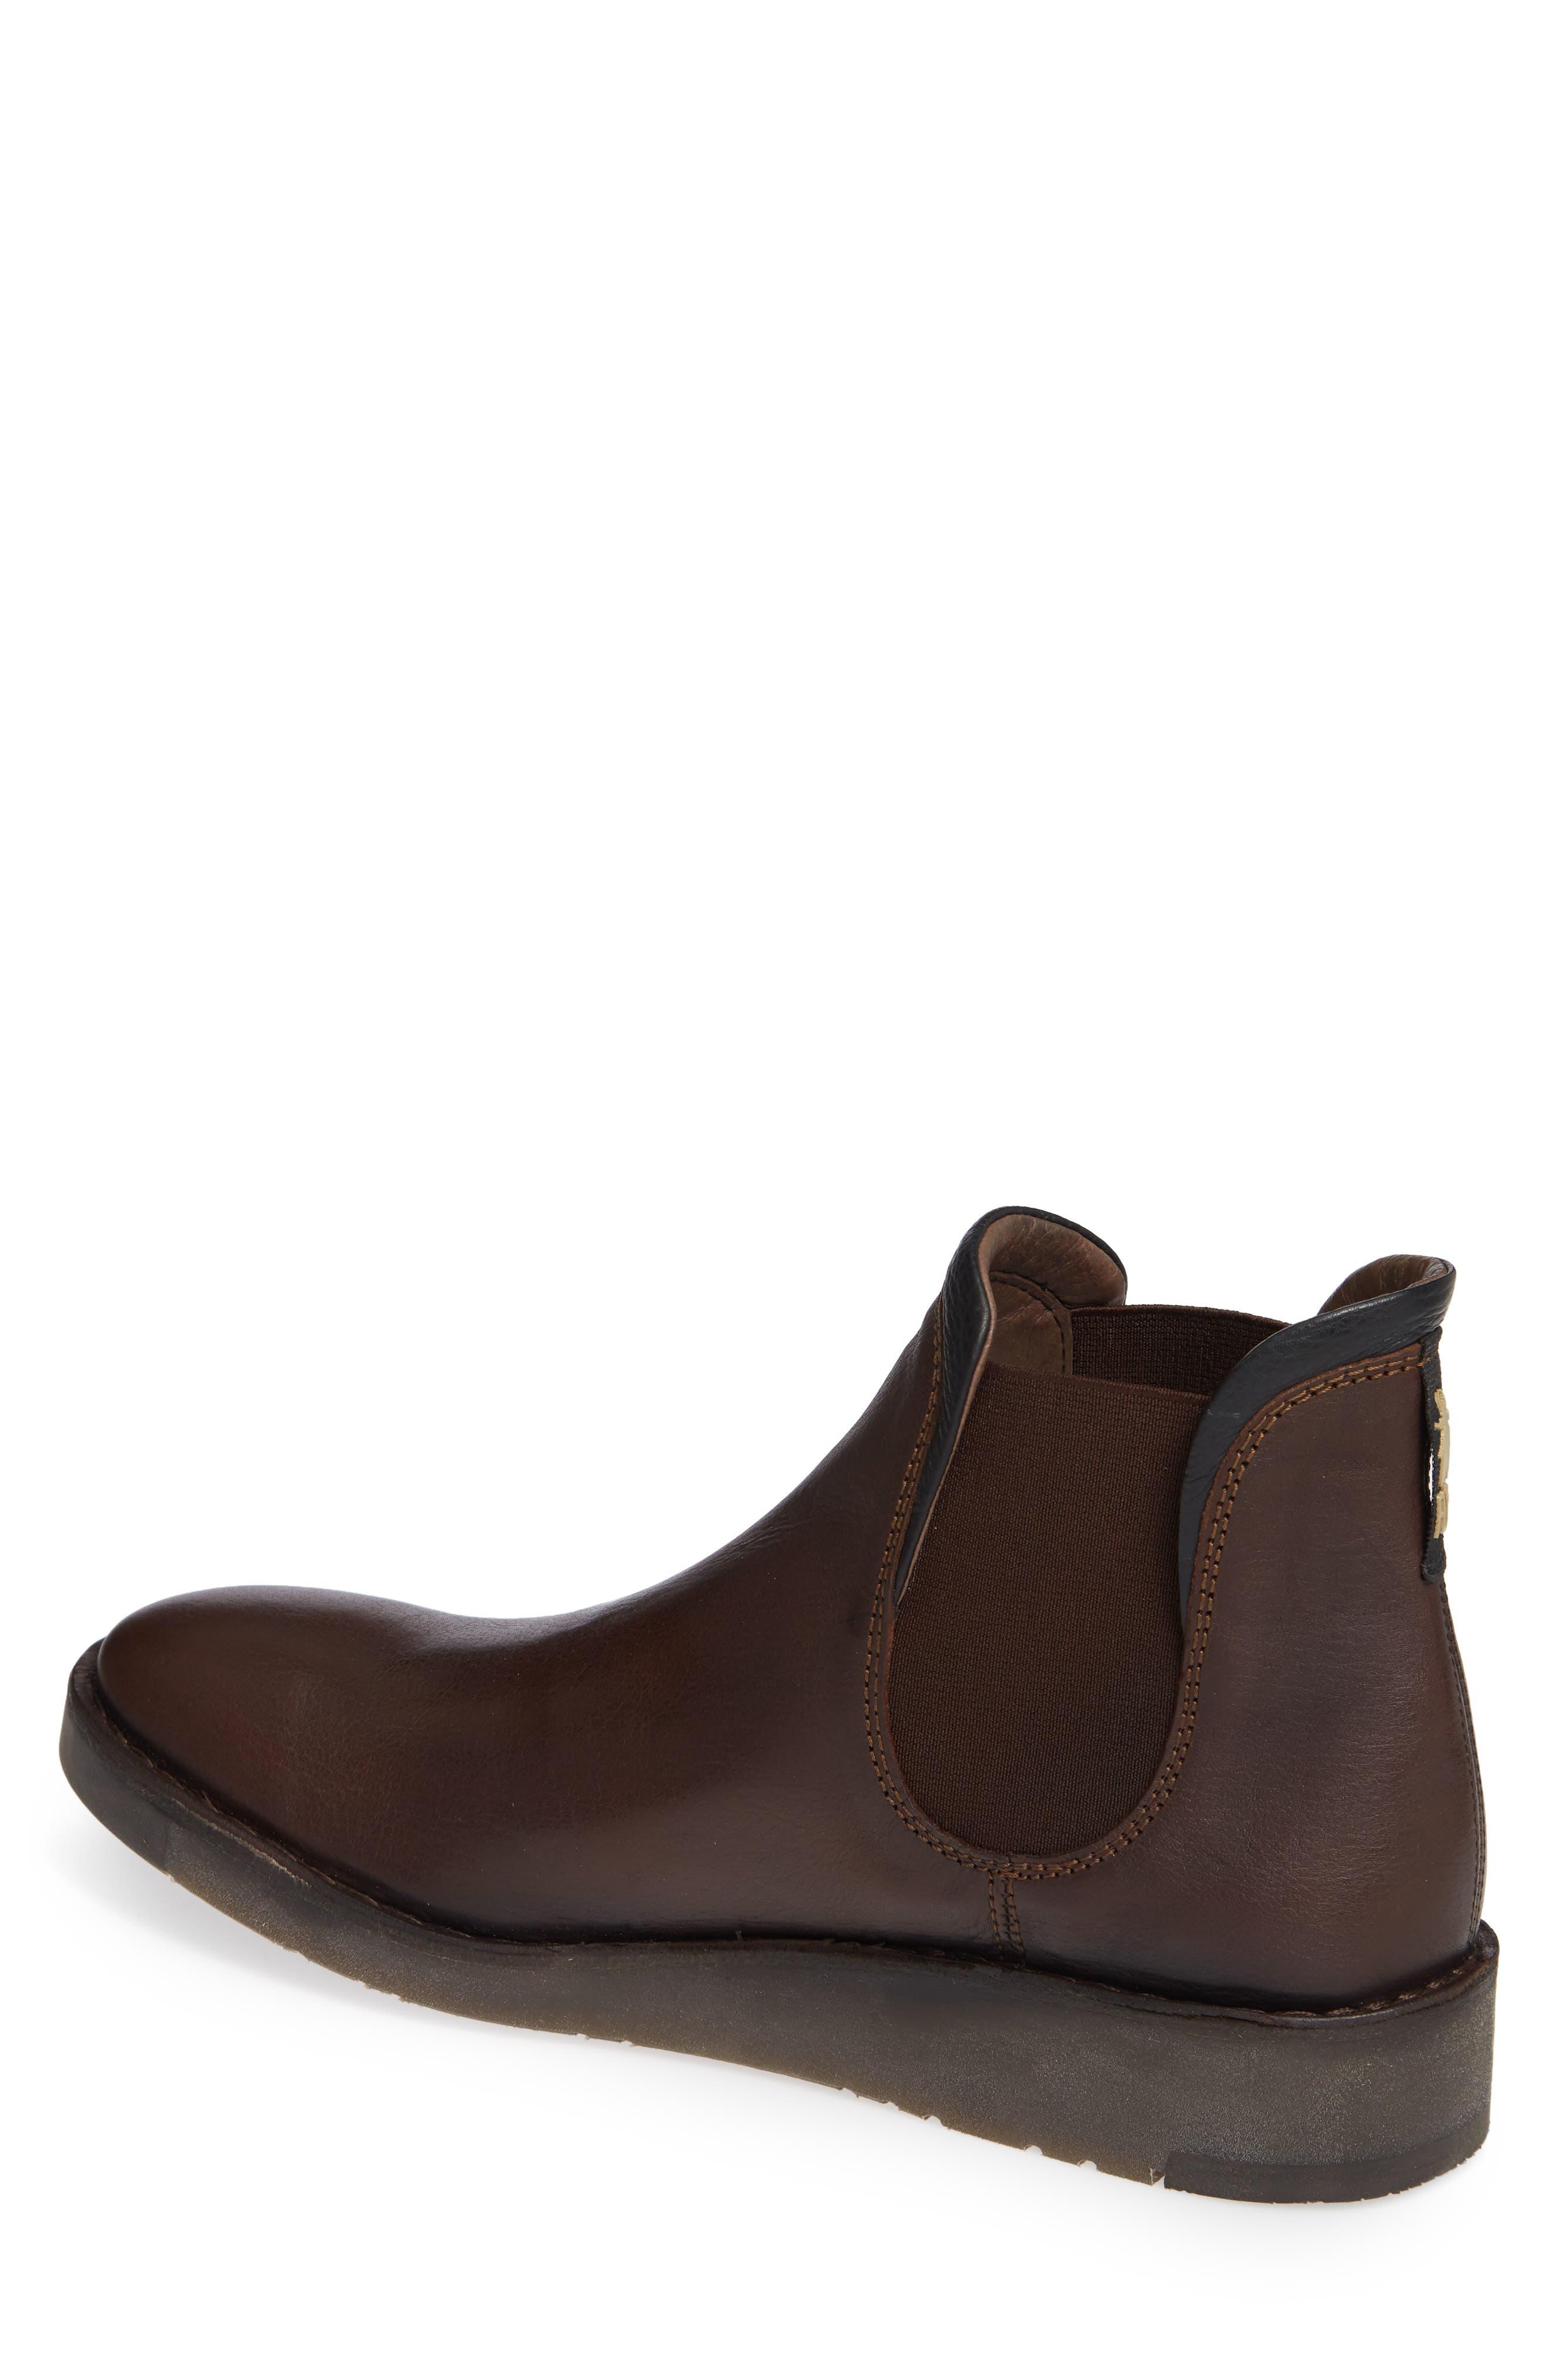 Sern Water Resistant Chelsea Boot,                             Alternate thumbnail 2, color,                             Brown Apso